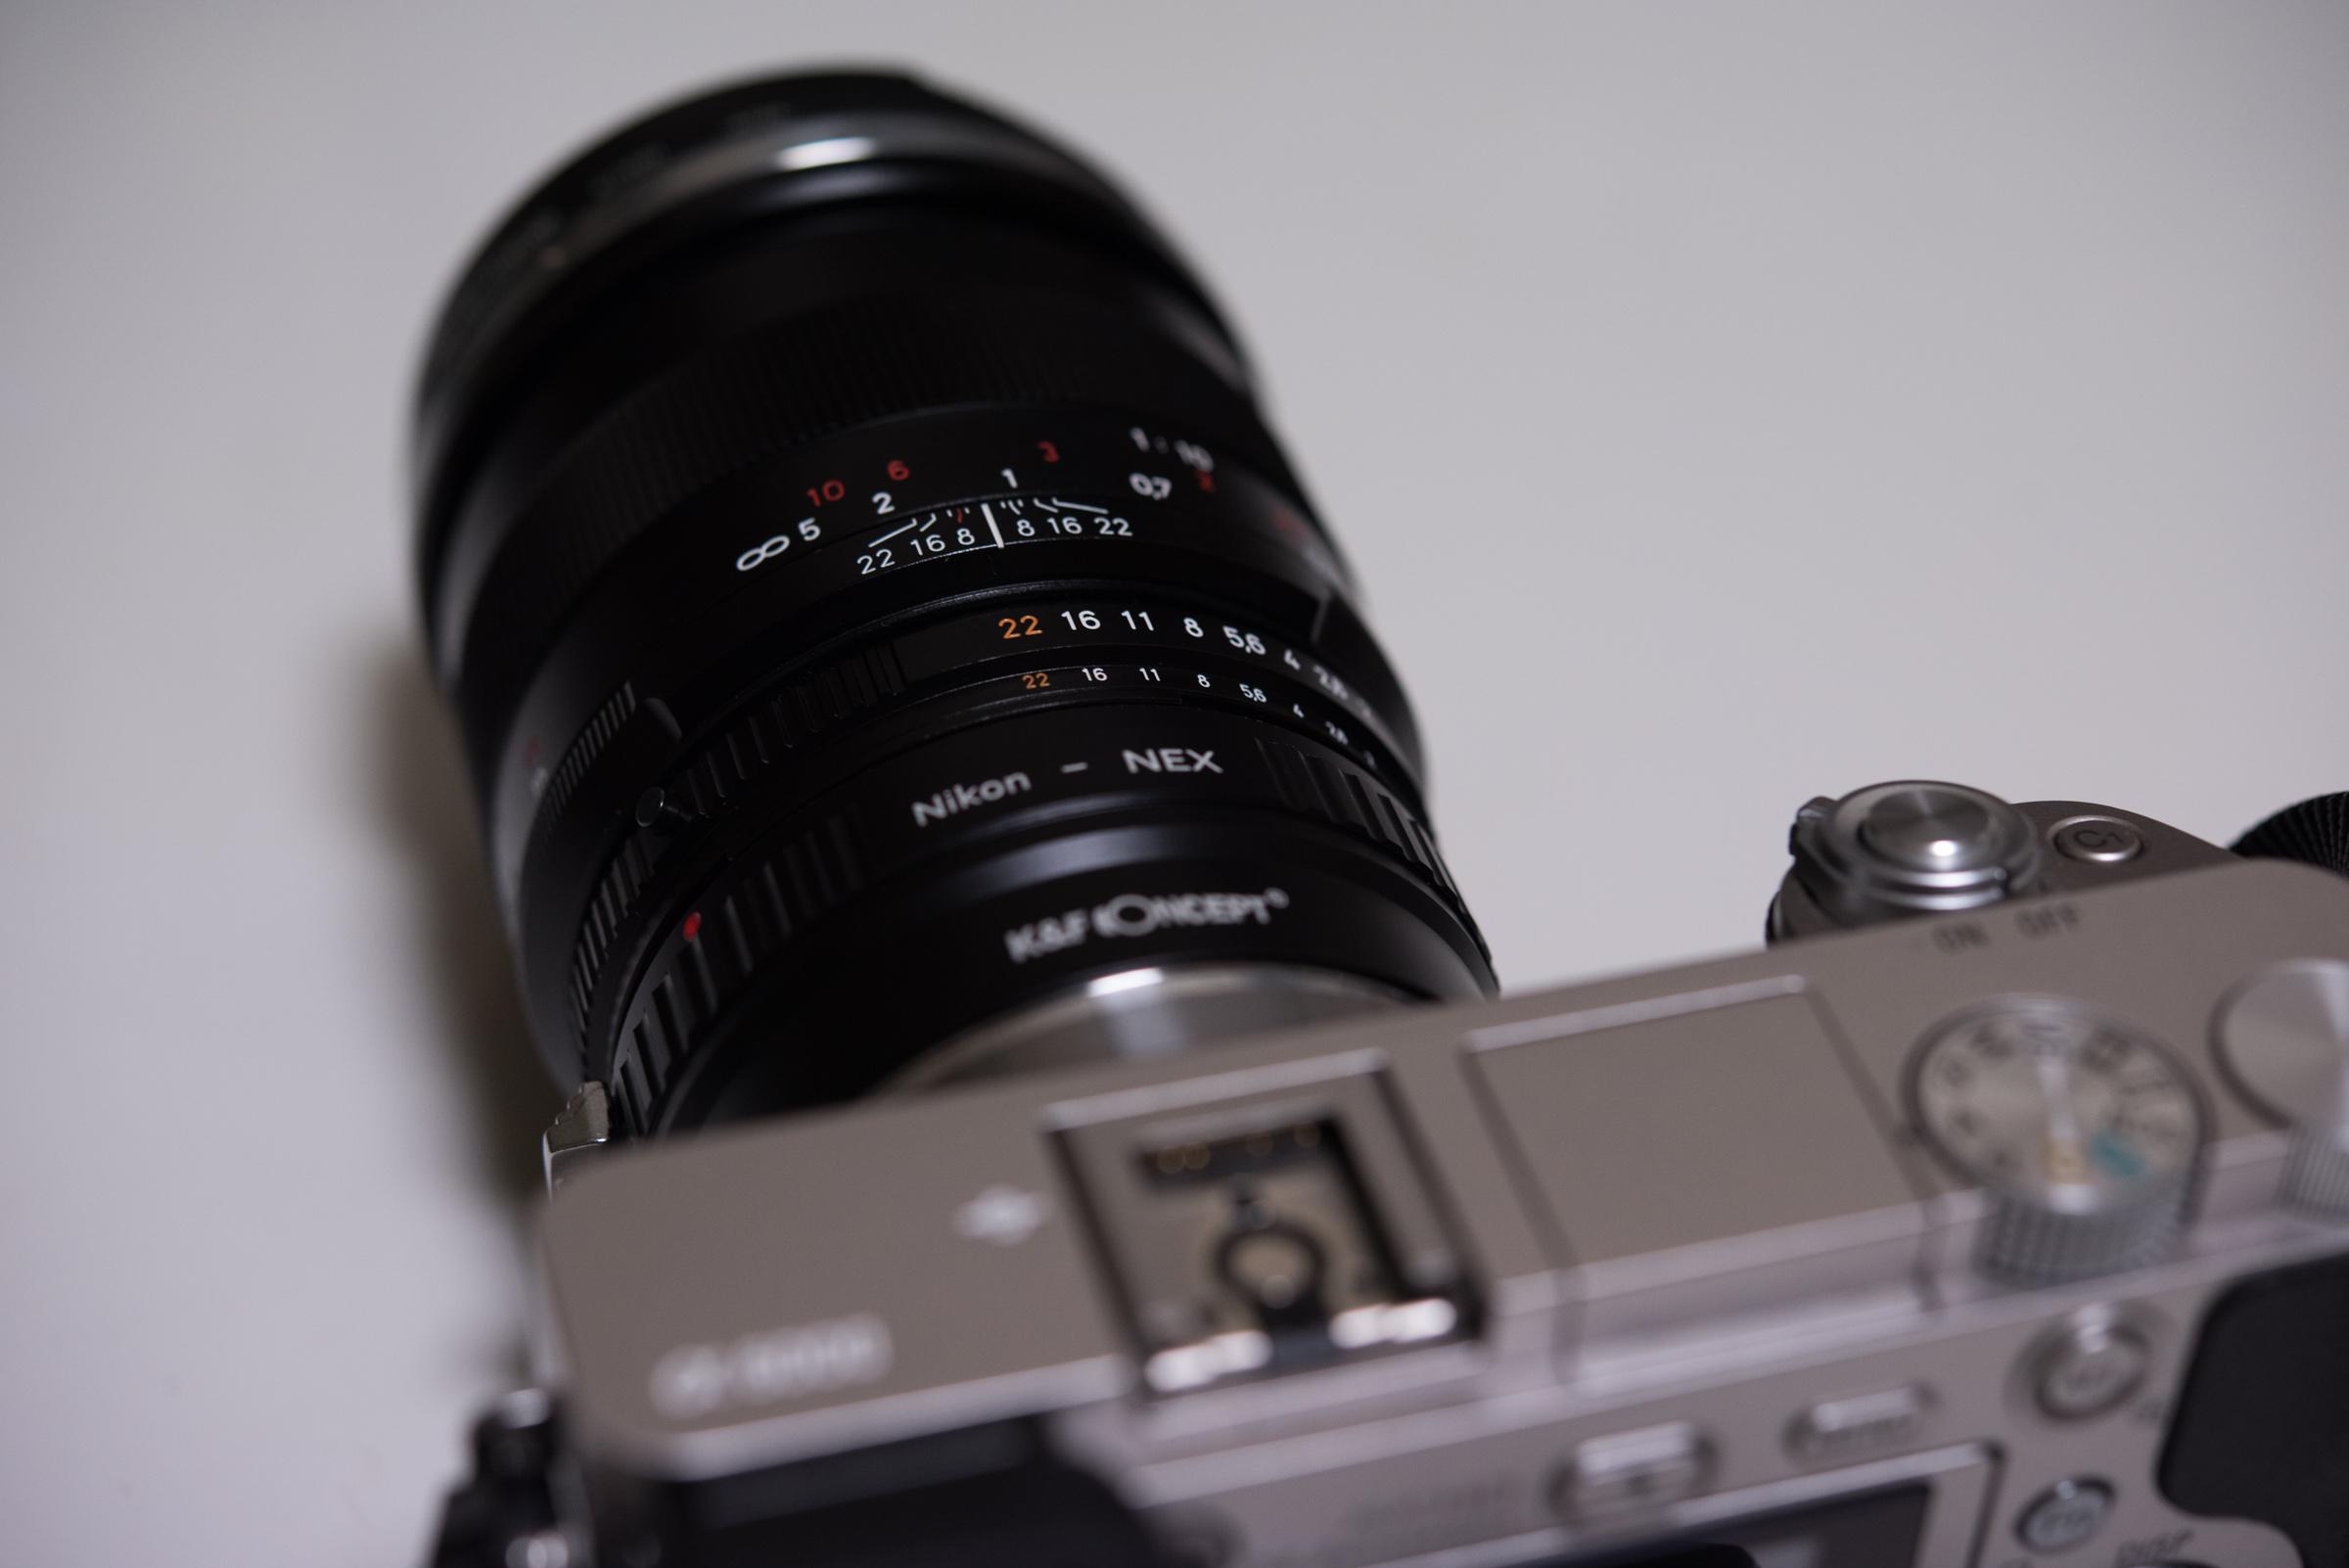 K&F Concept AIレンズ- Sony NEX E を買ったぞ!